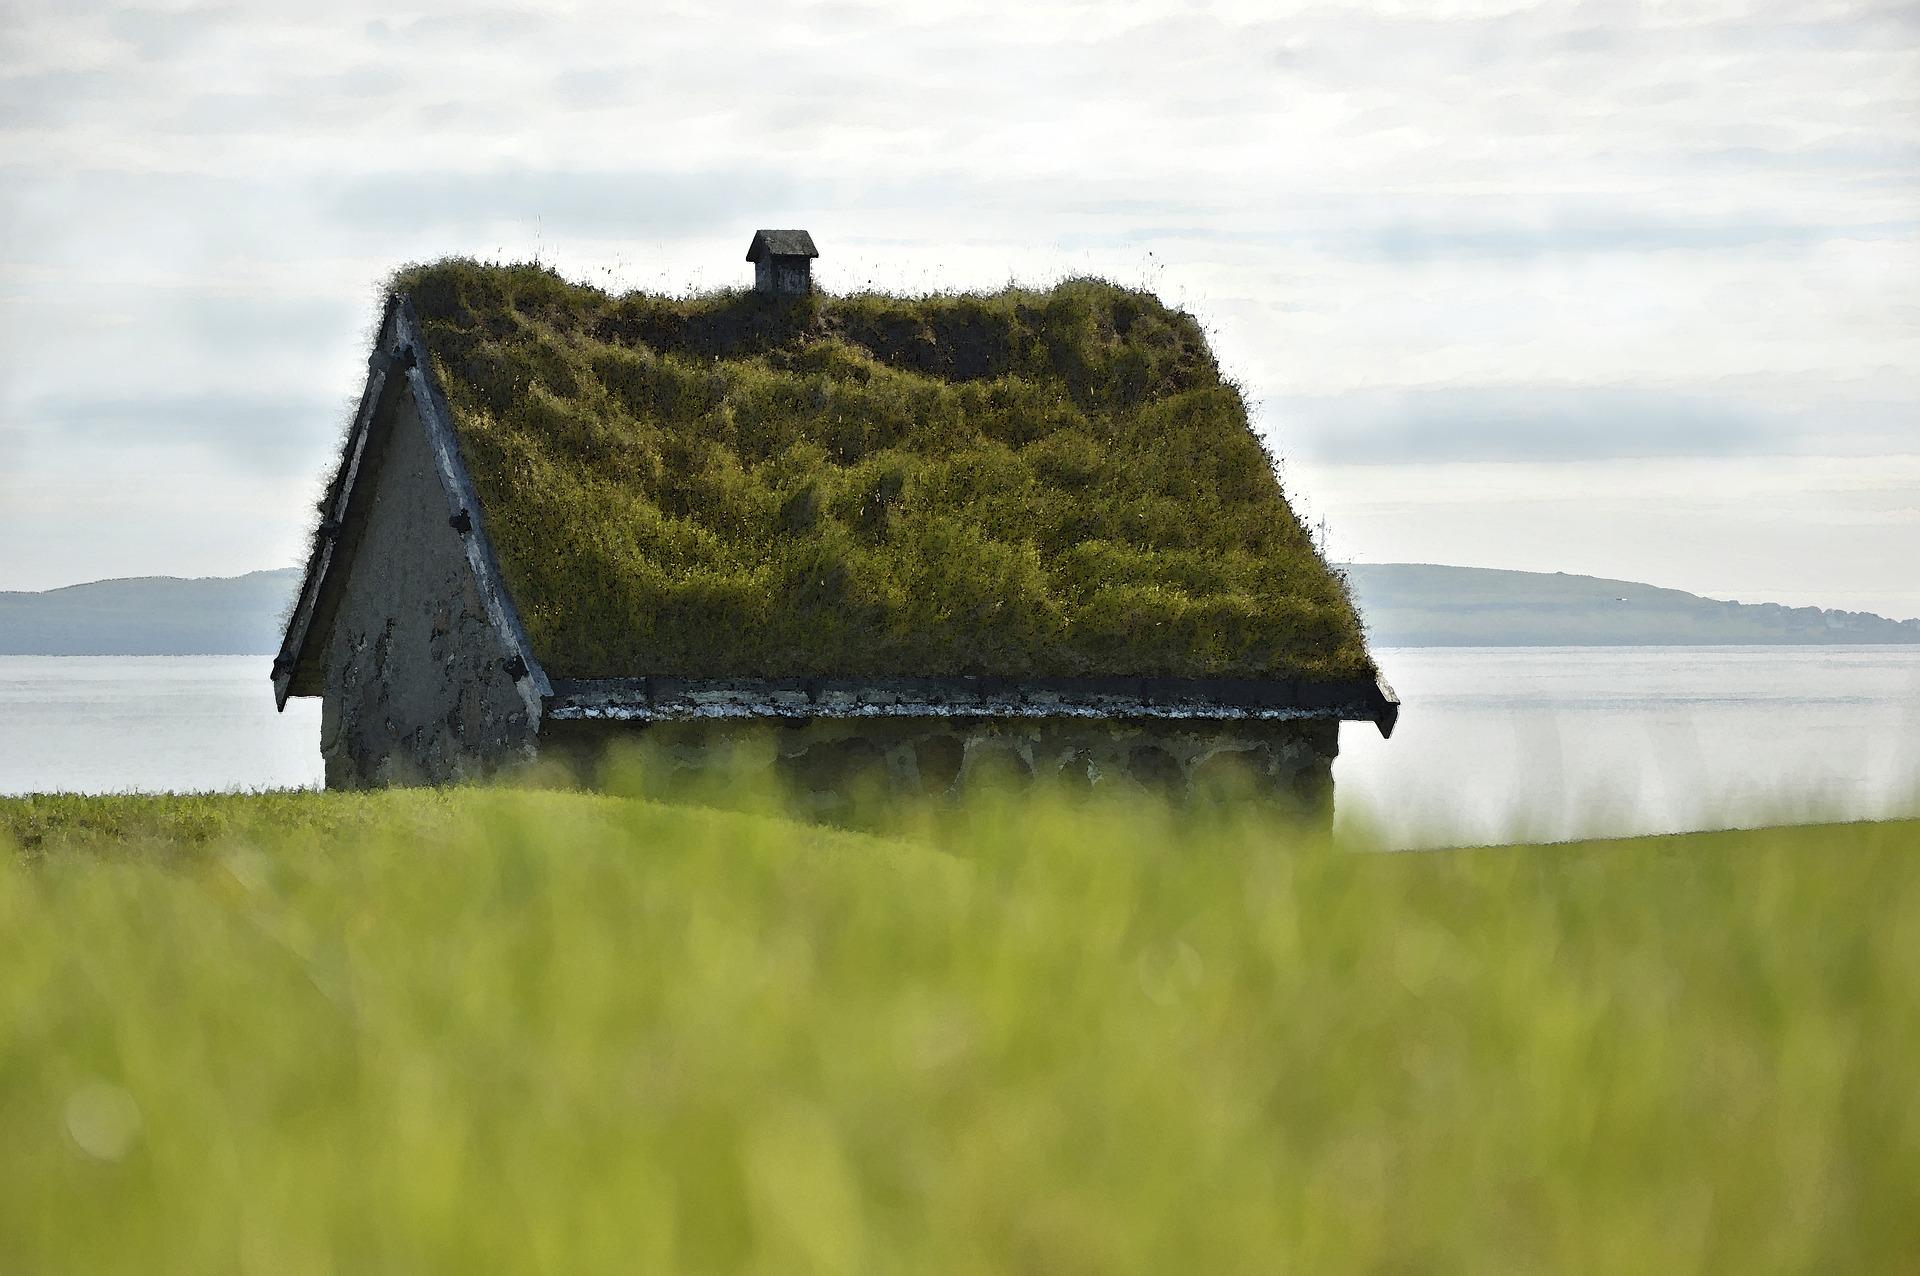 stone-house-4193002_1920